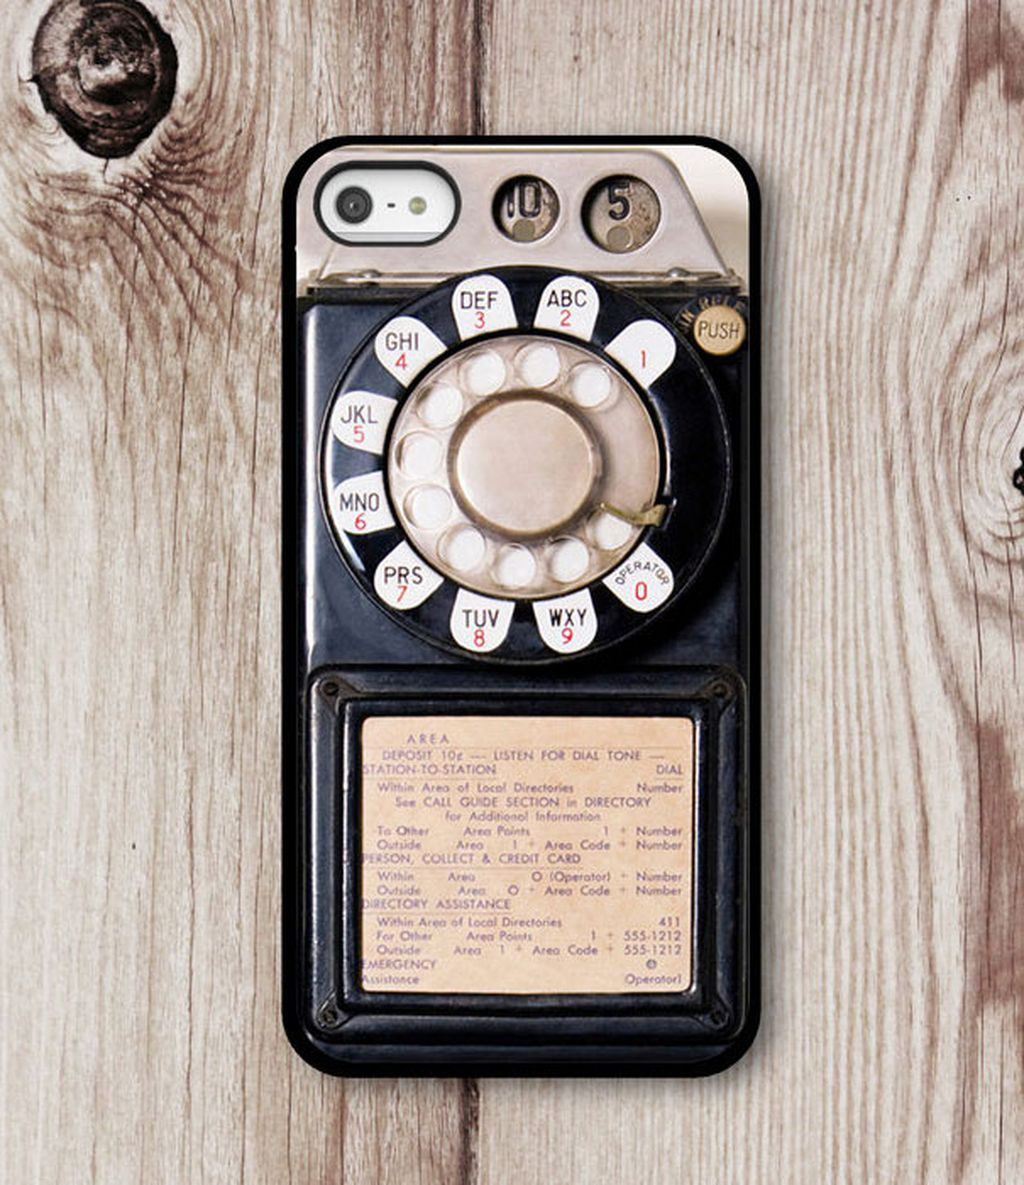 Casing seperti telepon lama. Foto: istimewa